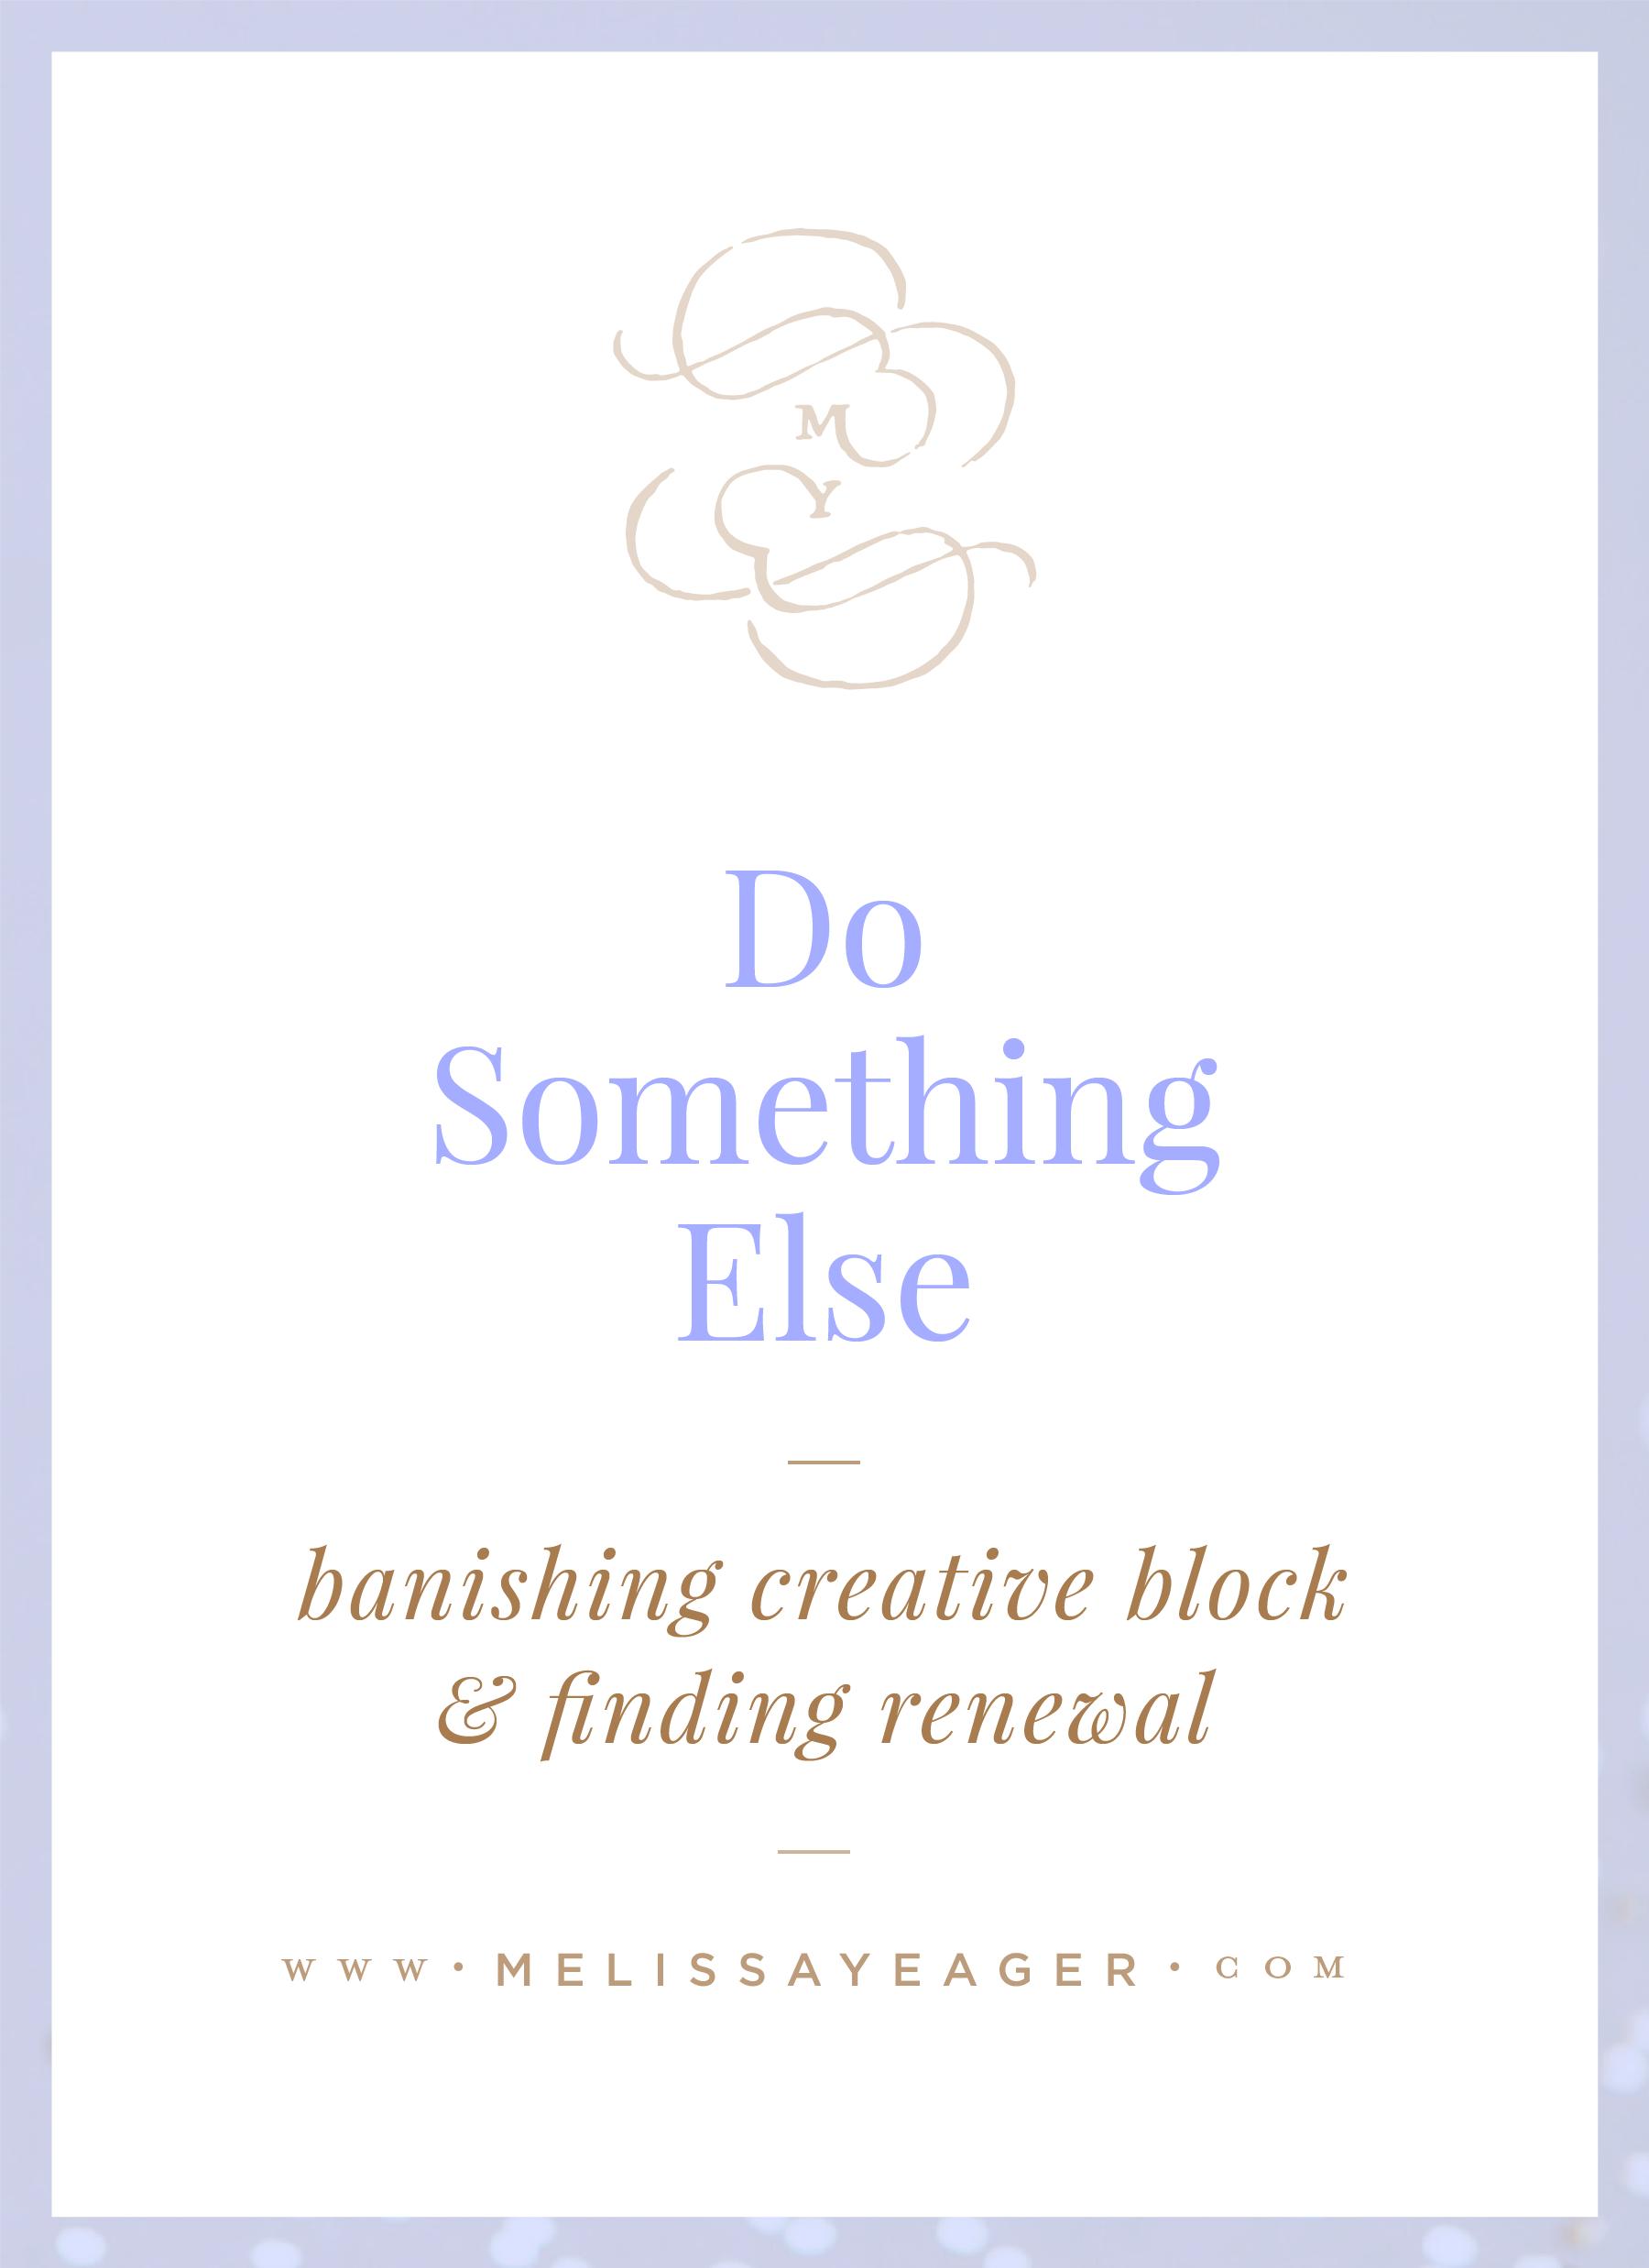 Do Something Else - banishing creative block & finding renewal